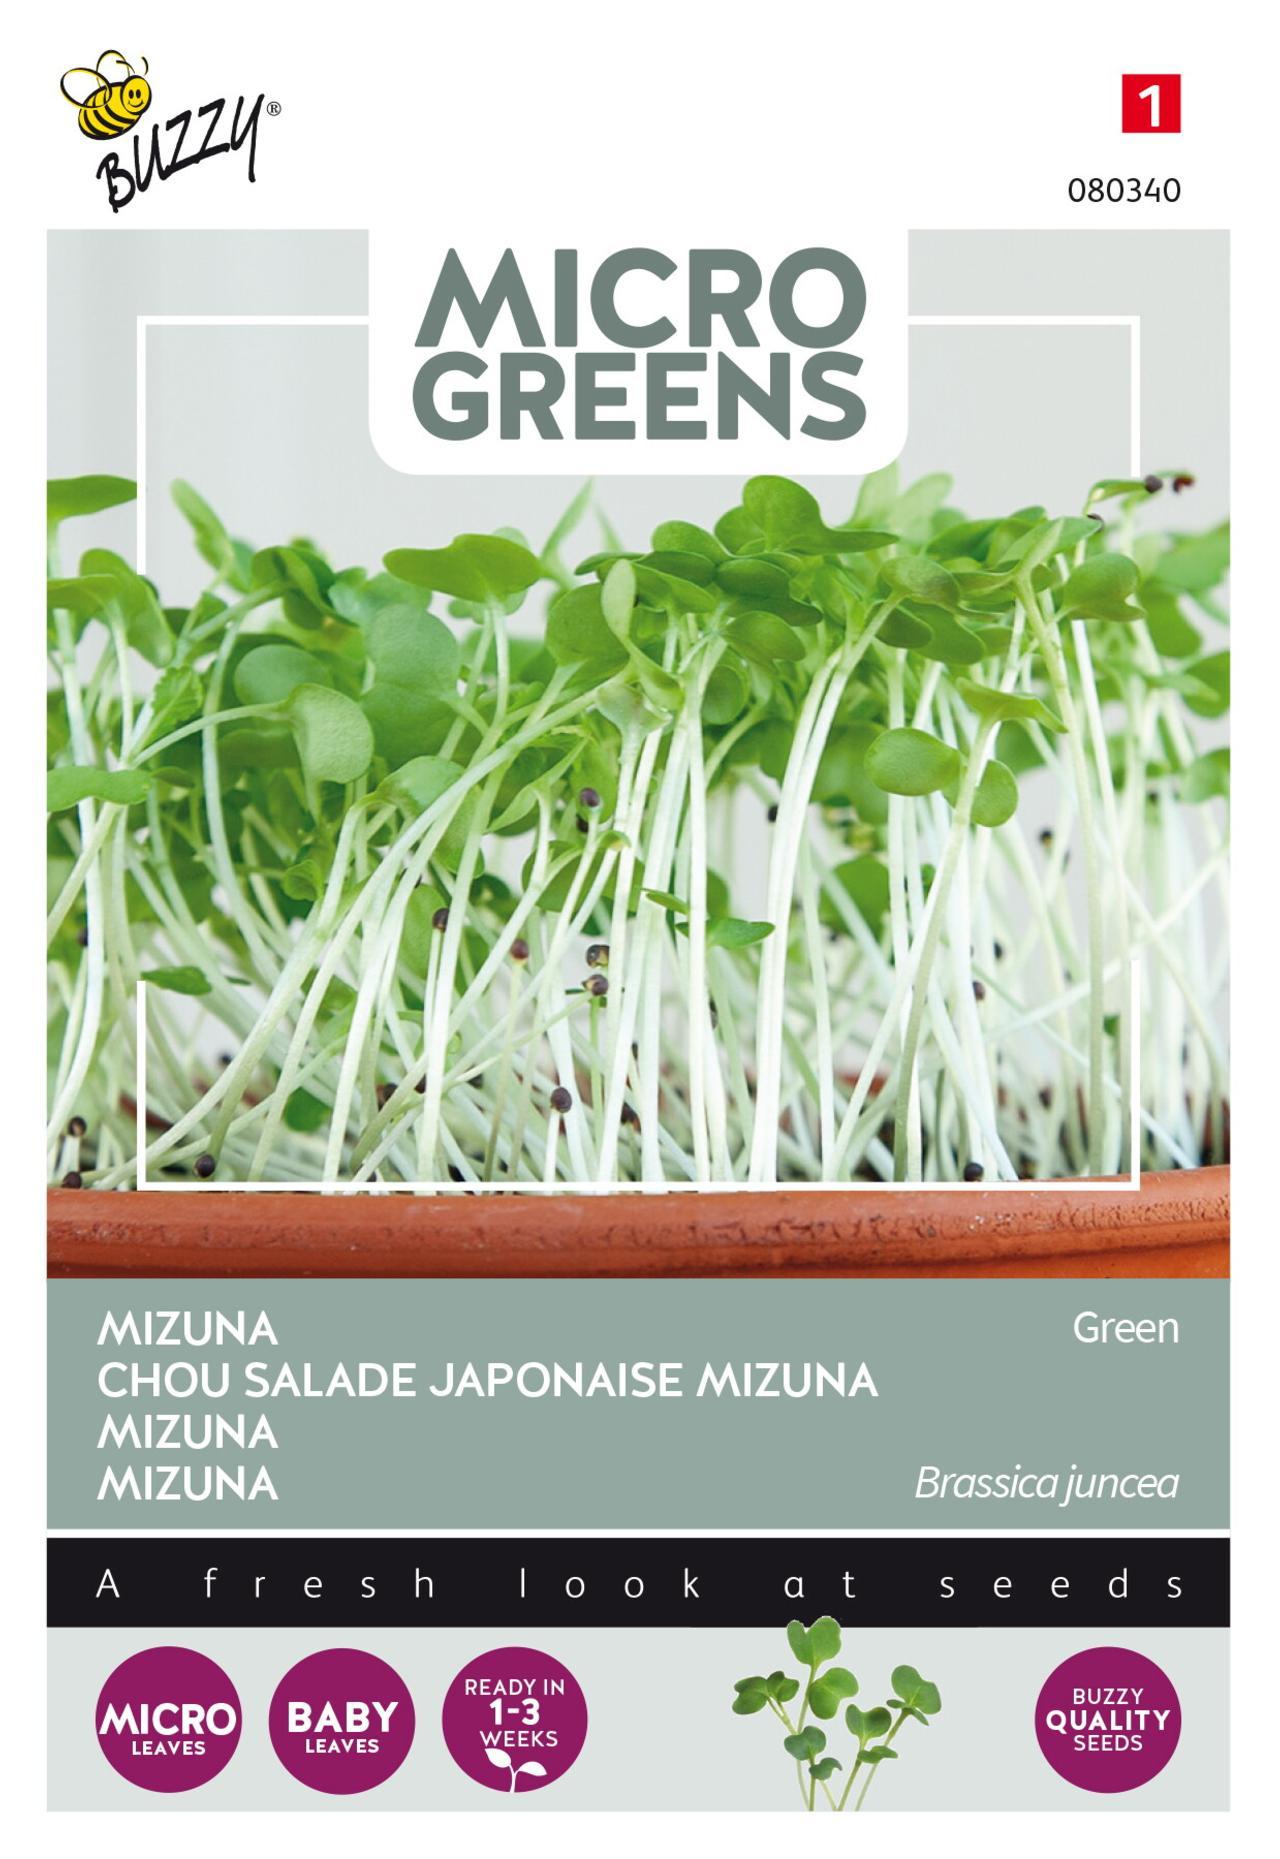 Brassica juncea var. japonica 'Green' (microgreens) plant